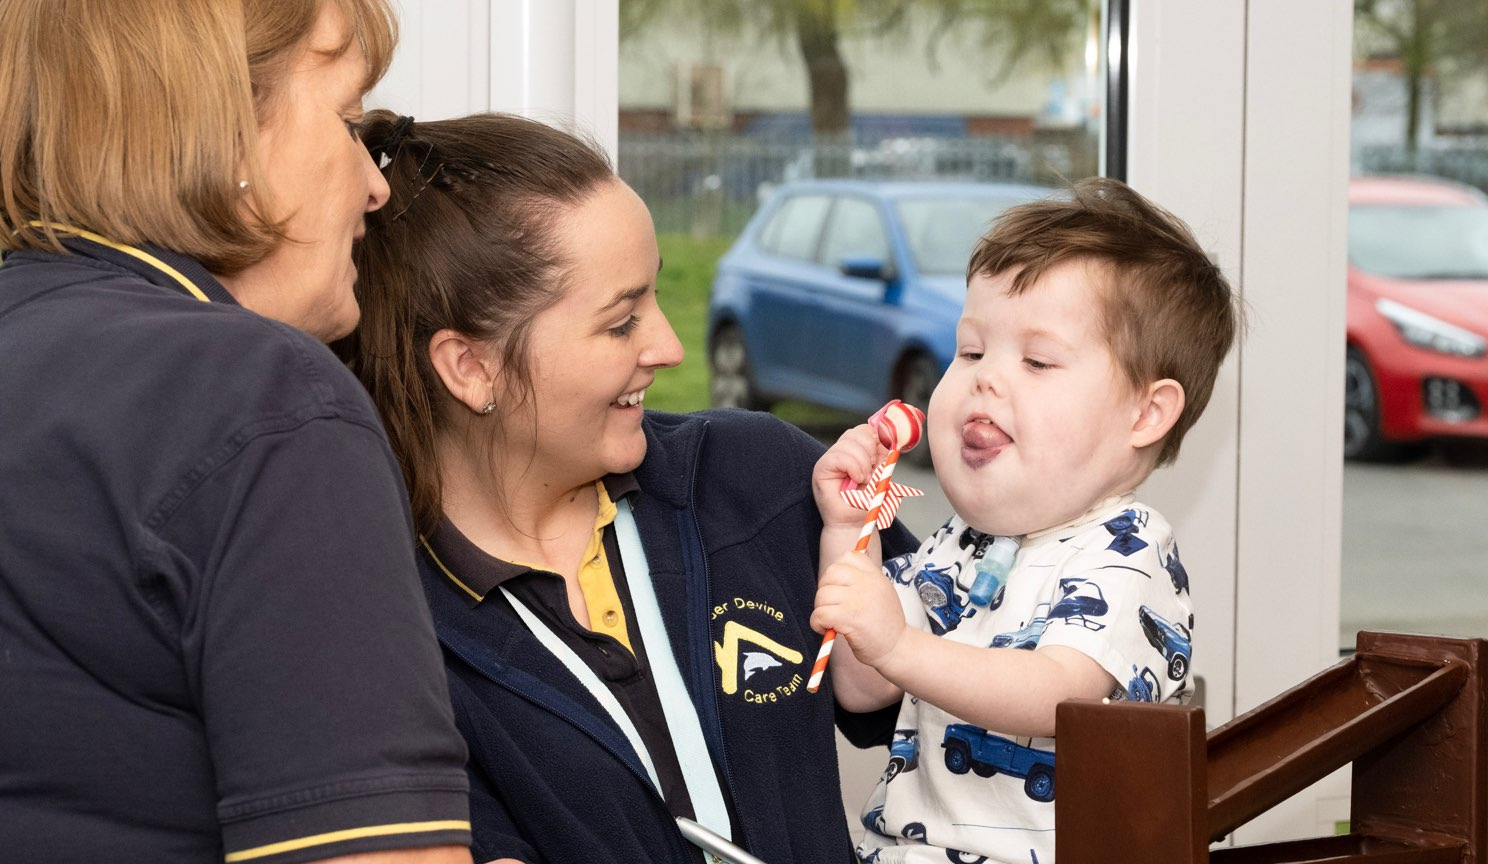 Alexander Devine care team with little boy.